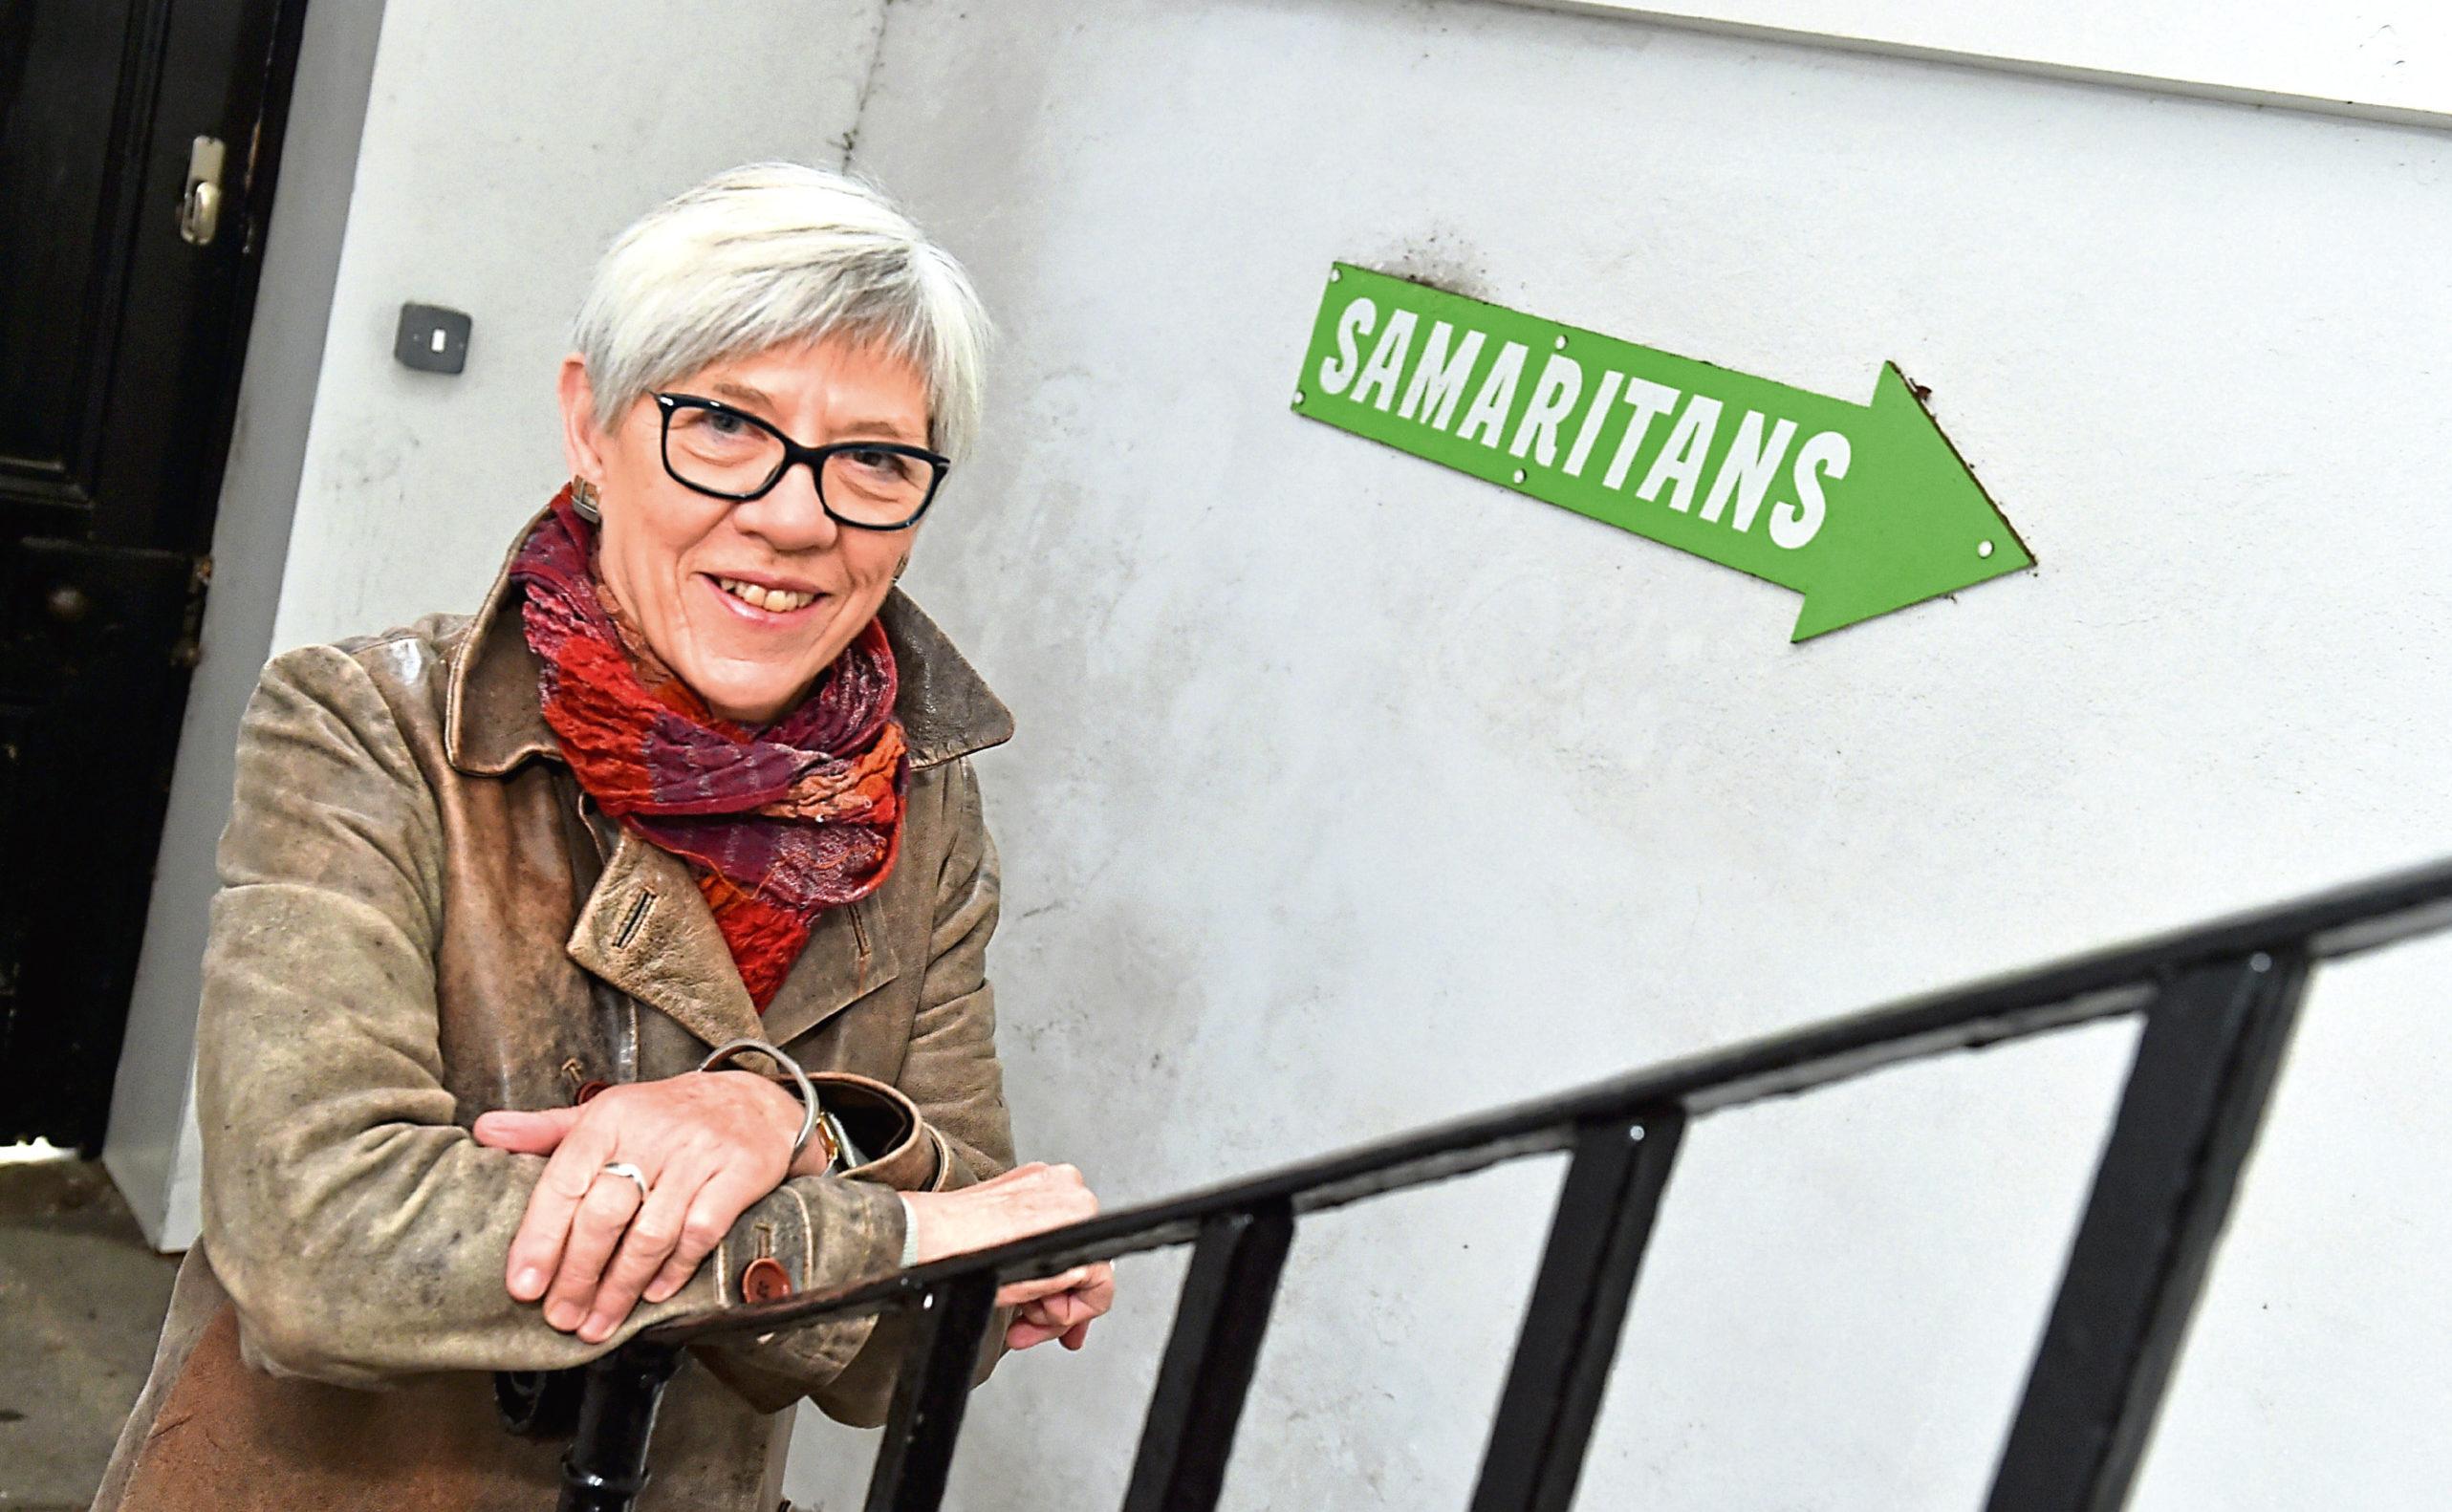 Elaine Mottram is encouraging people to raise vital funds for Samaritans.